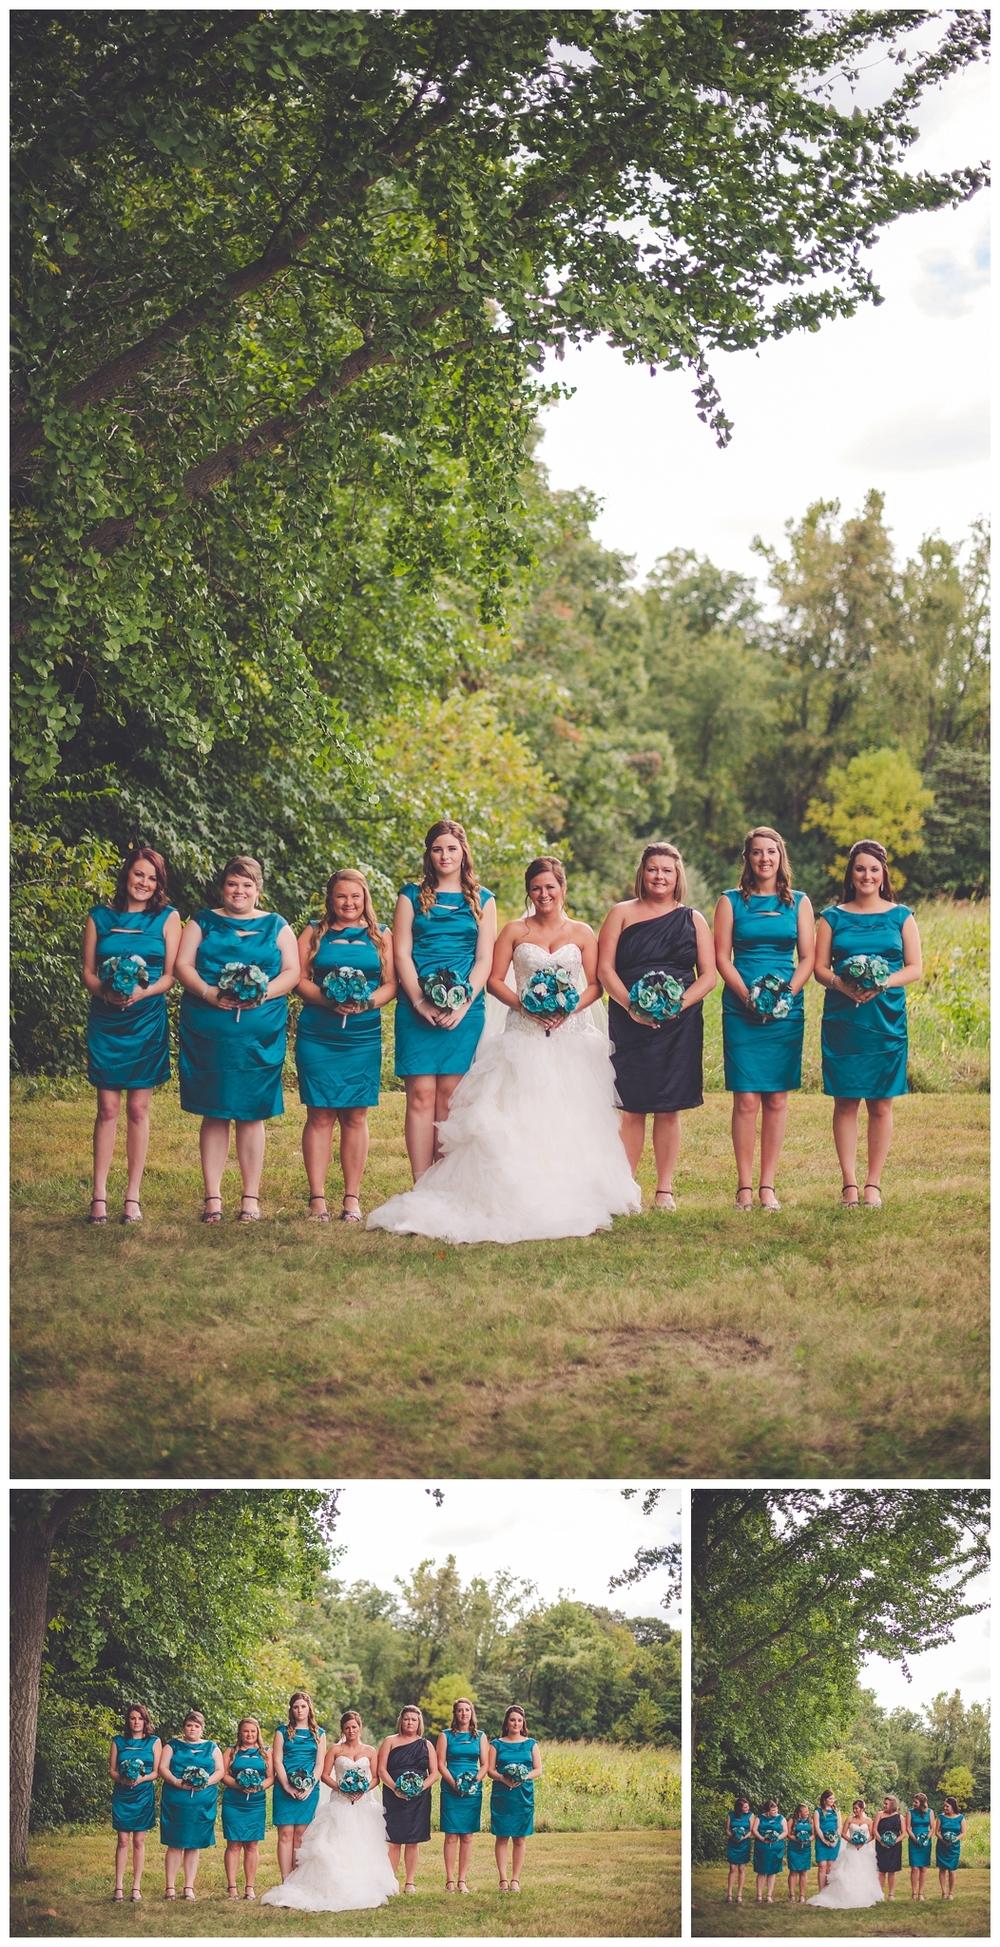 By Kara - By Kara Photo - Kara Evans - Central Illinois Wedding Photographer - Alton Illinois Wedding Photographer - Wood River Wedding